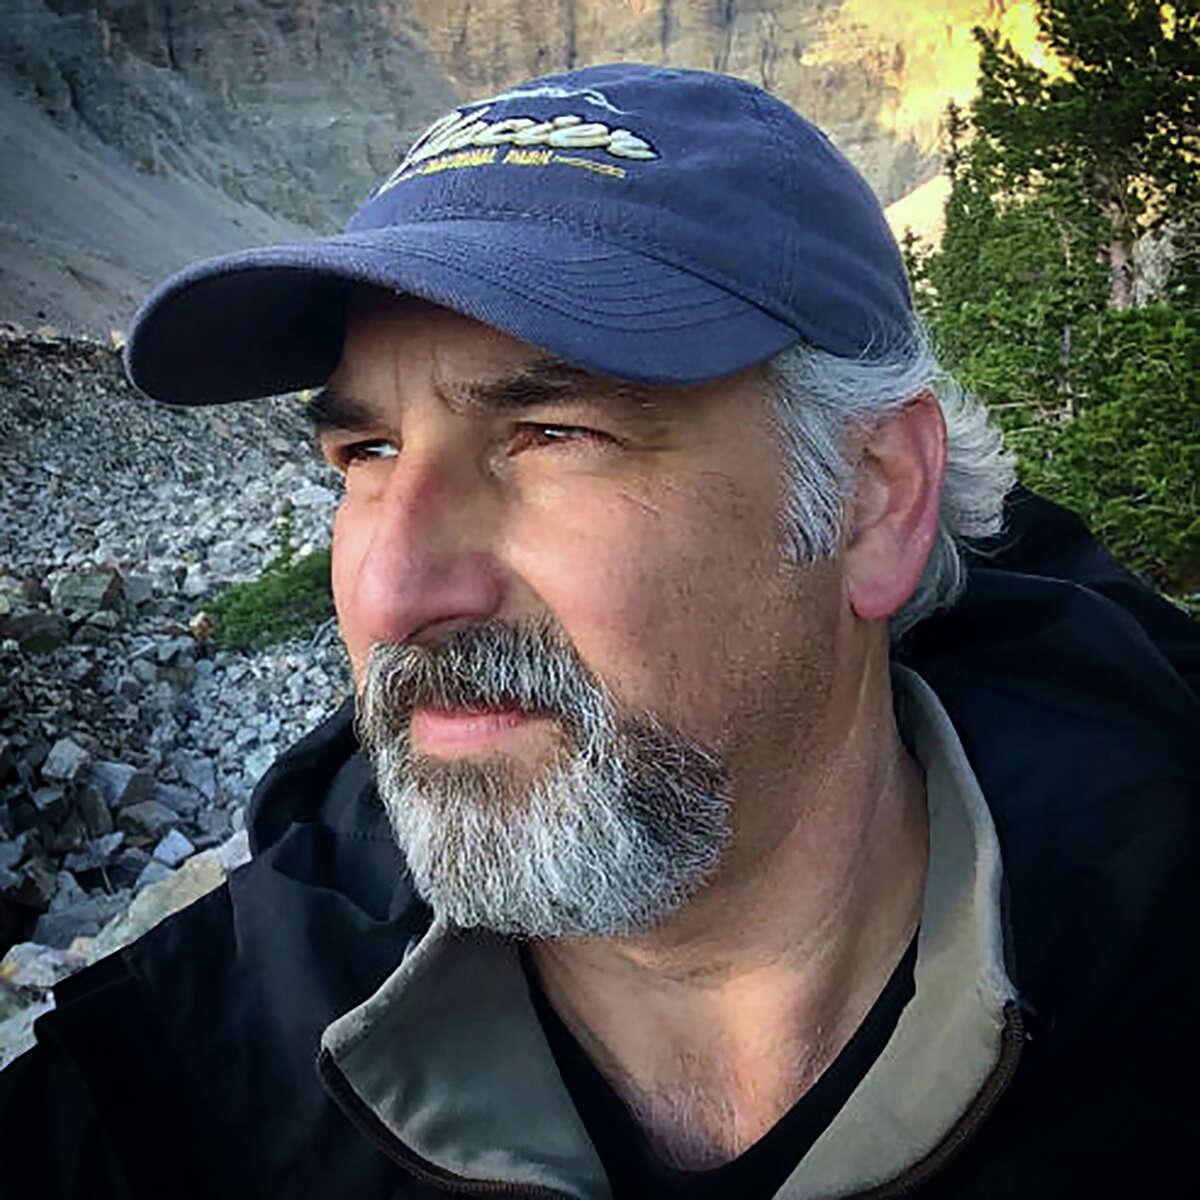 An iPhone photo of photographer Mark Burns in Great Basin National Park, Nevada.